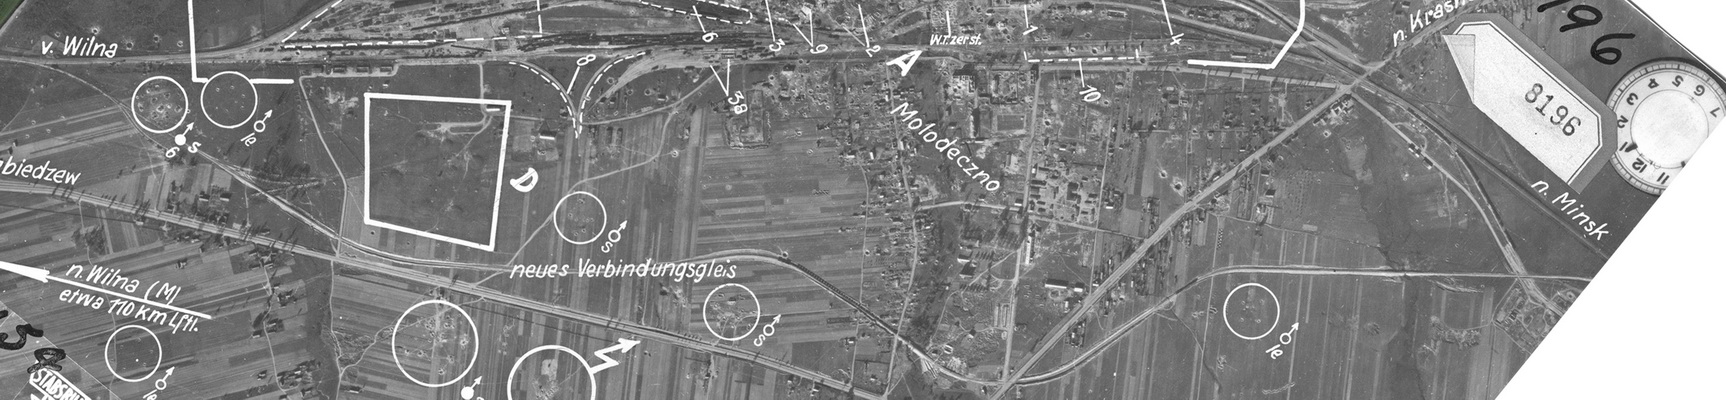 чыгунка 1944 нью net